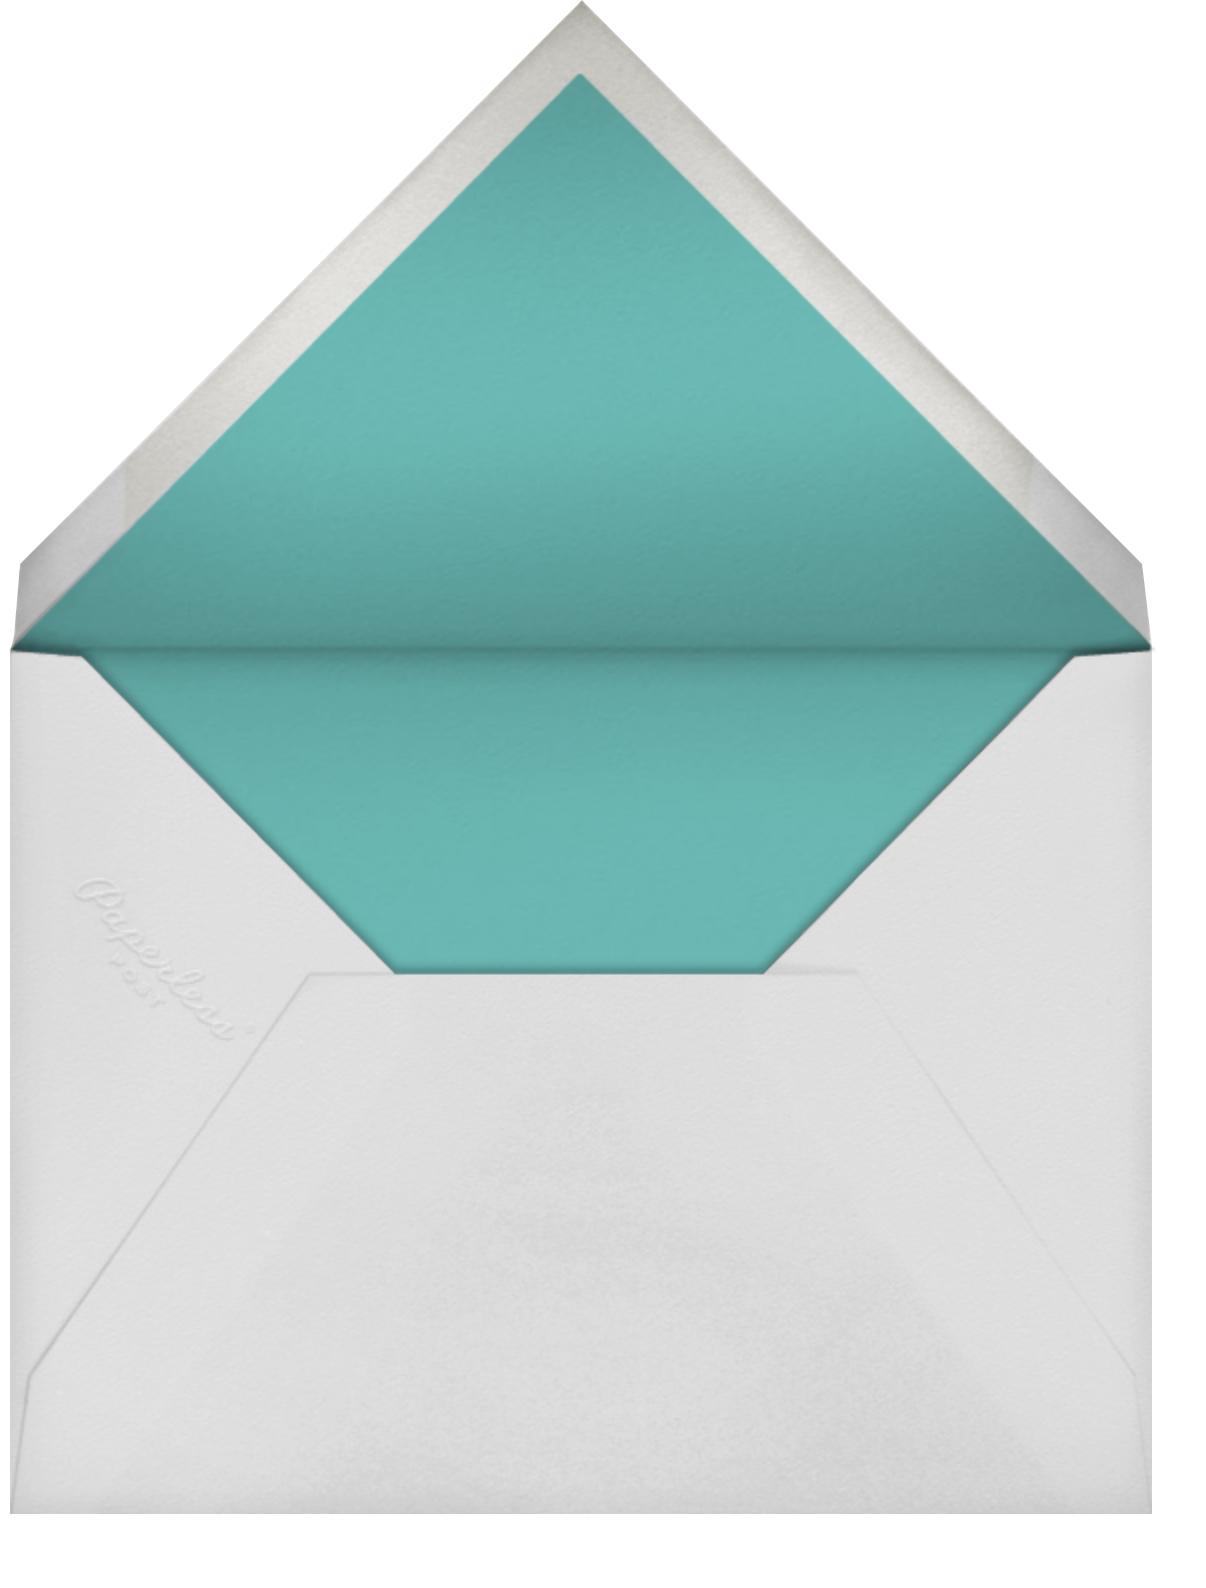 Squirrel Thanks (Meg Hunt) - Red Cap Cards - Envelope